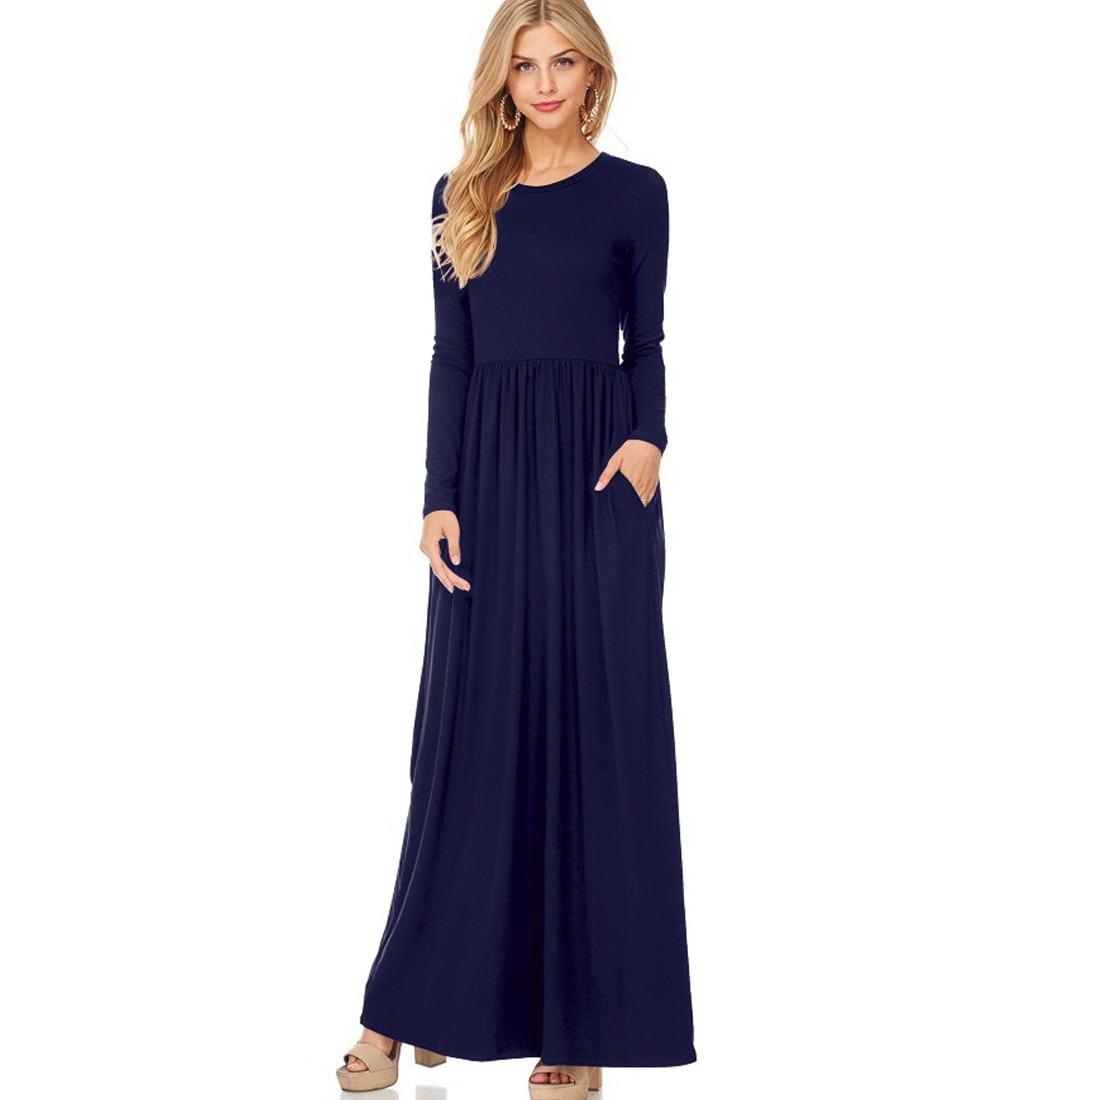 e057a6b742b Long Sleeve Occasion Maxi Dress - Data Dynamic AG